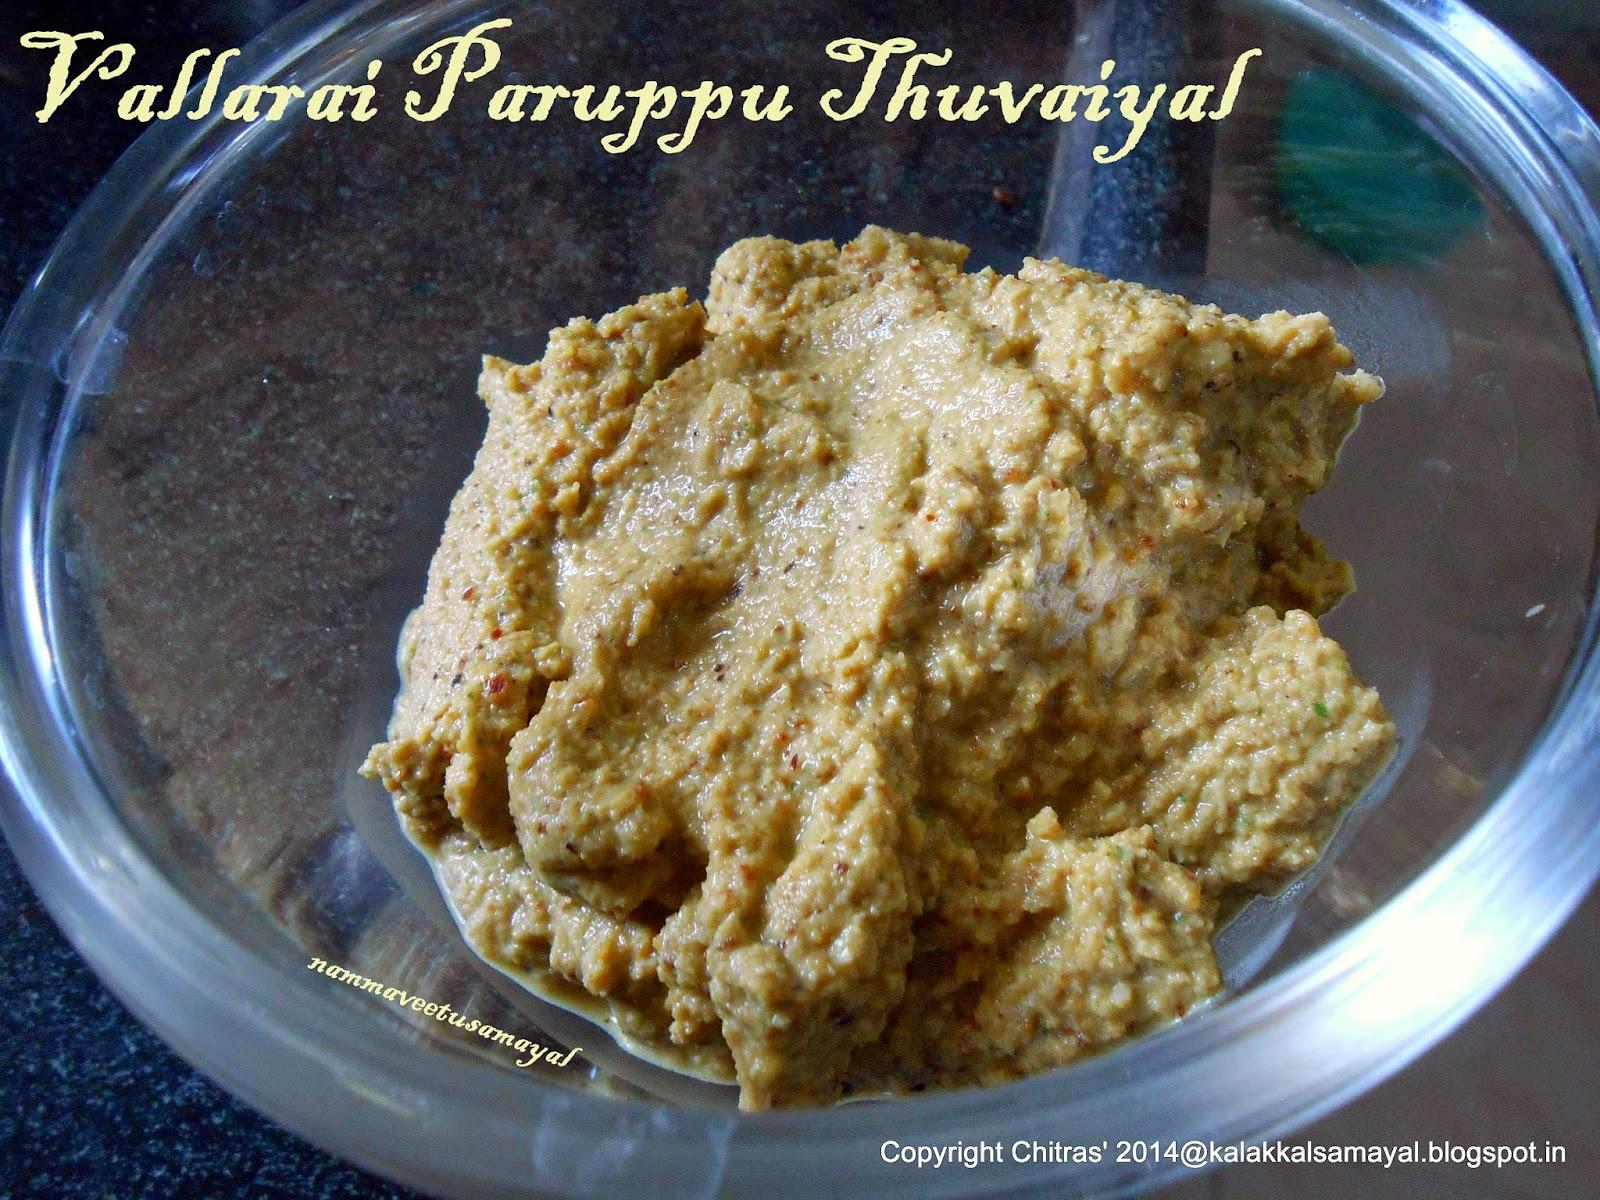 Vallarai Paruppu Thuvaiyal